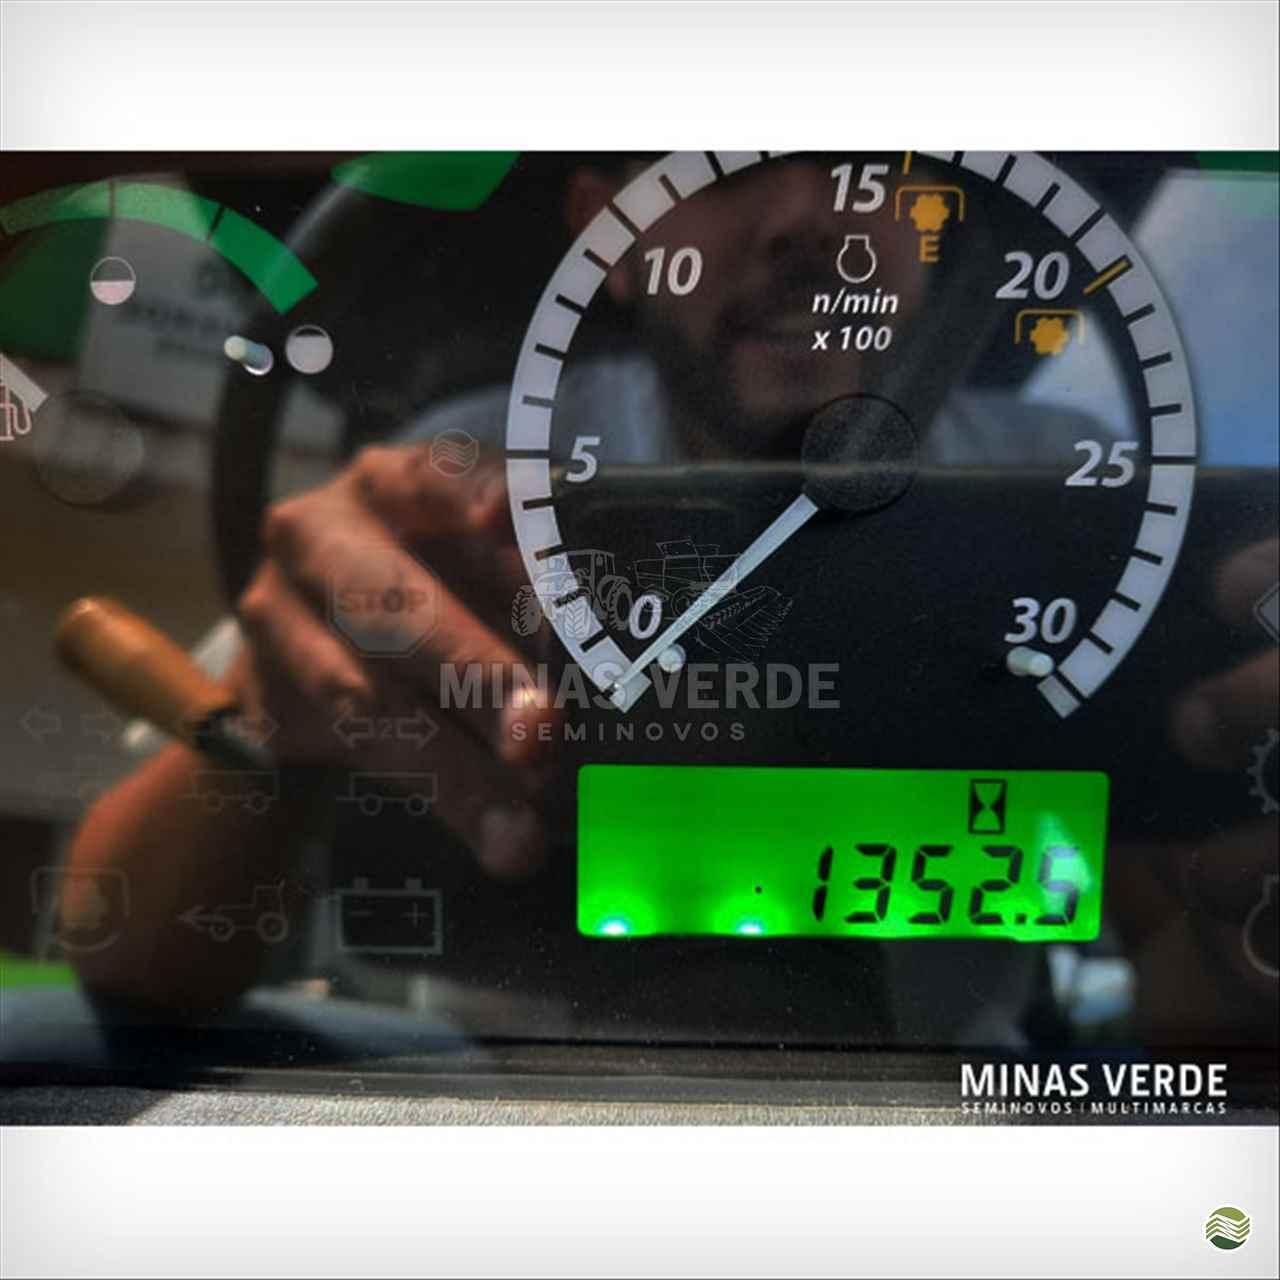 JOHN DEERE JOHN DEERE 5070  2019/2019 Minas Verde - Semi Novos